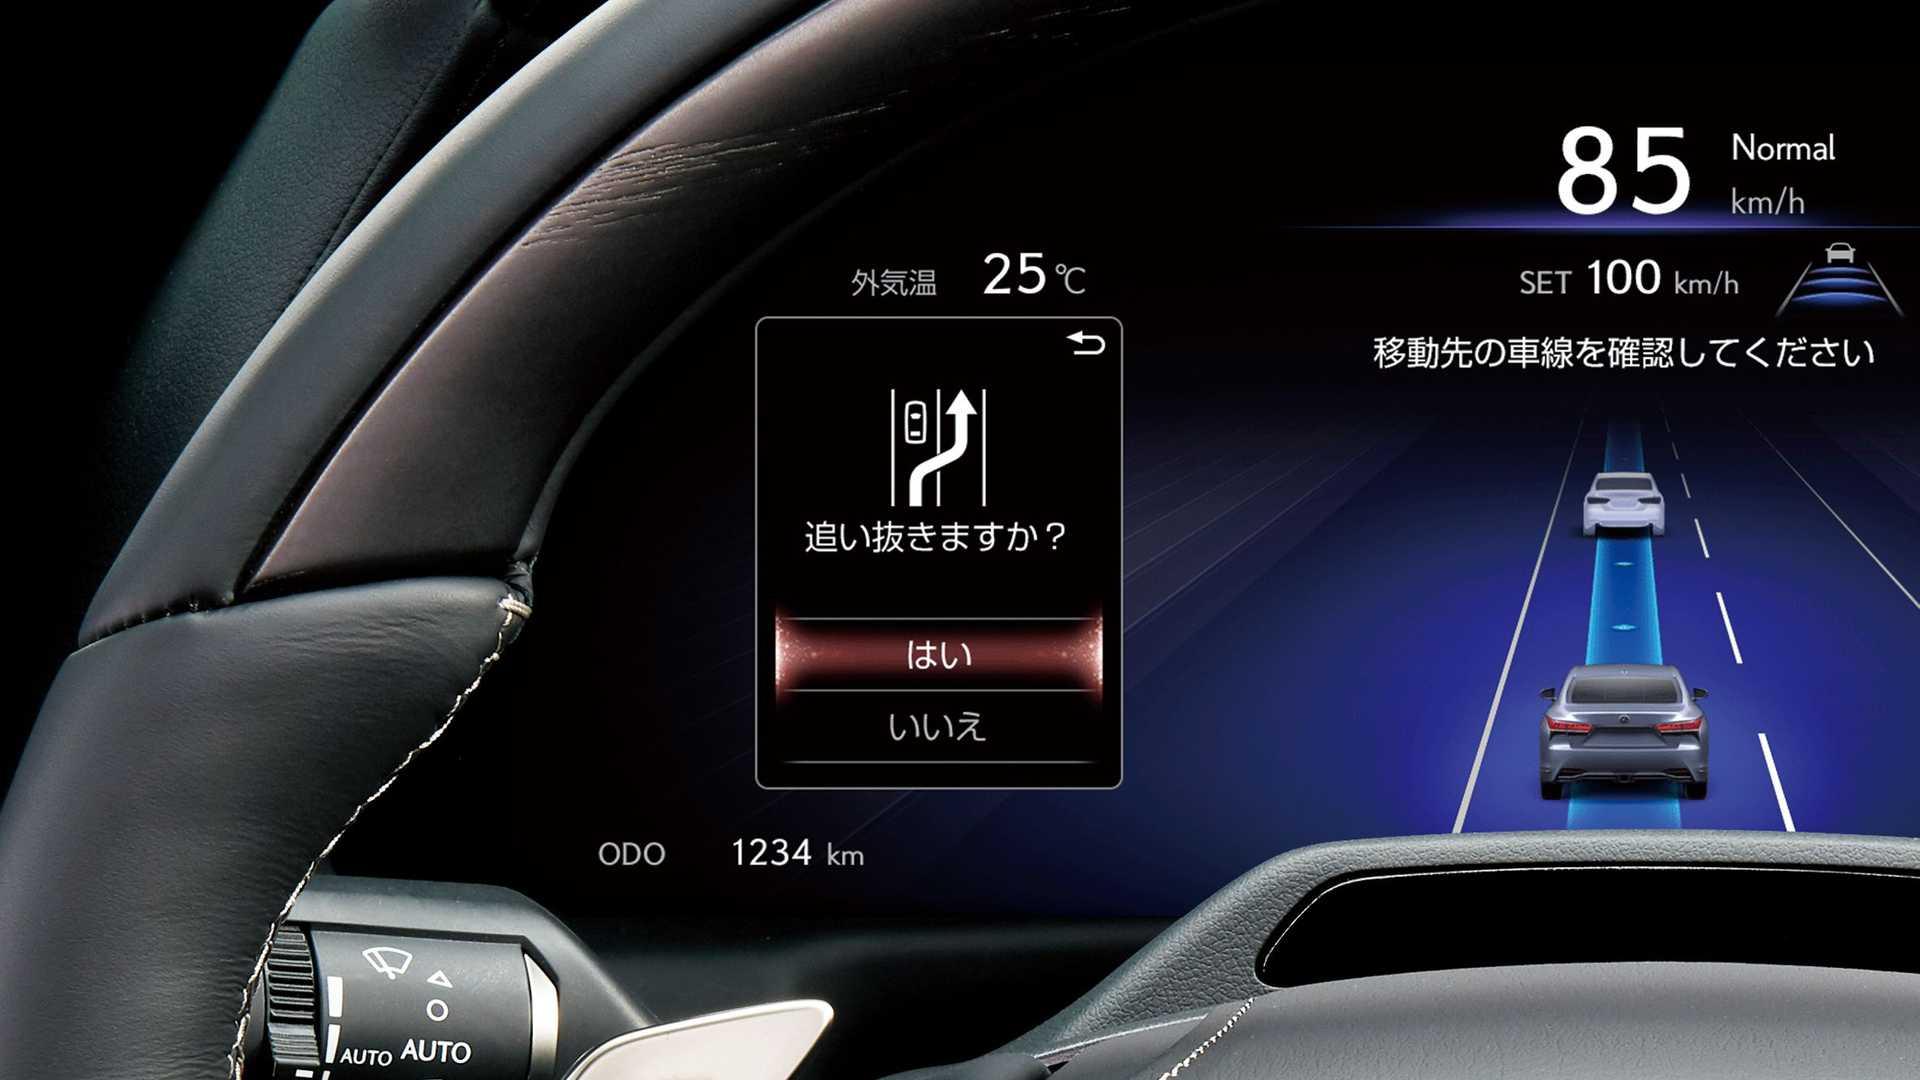 Lexus-LS-And-Toyota-Mirai-Advanced-Drive-20